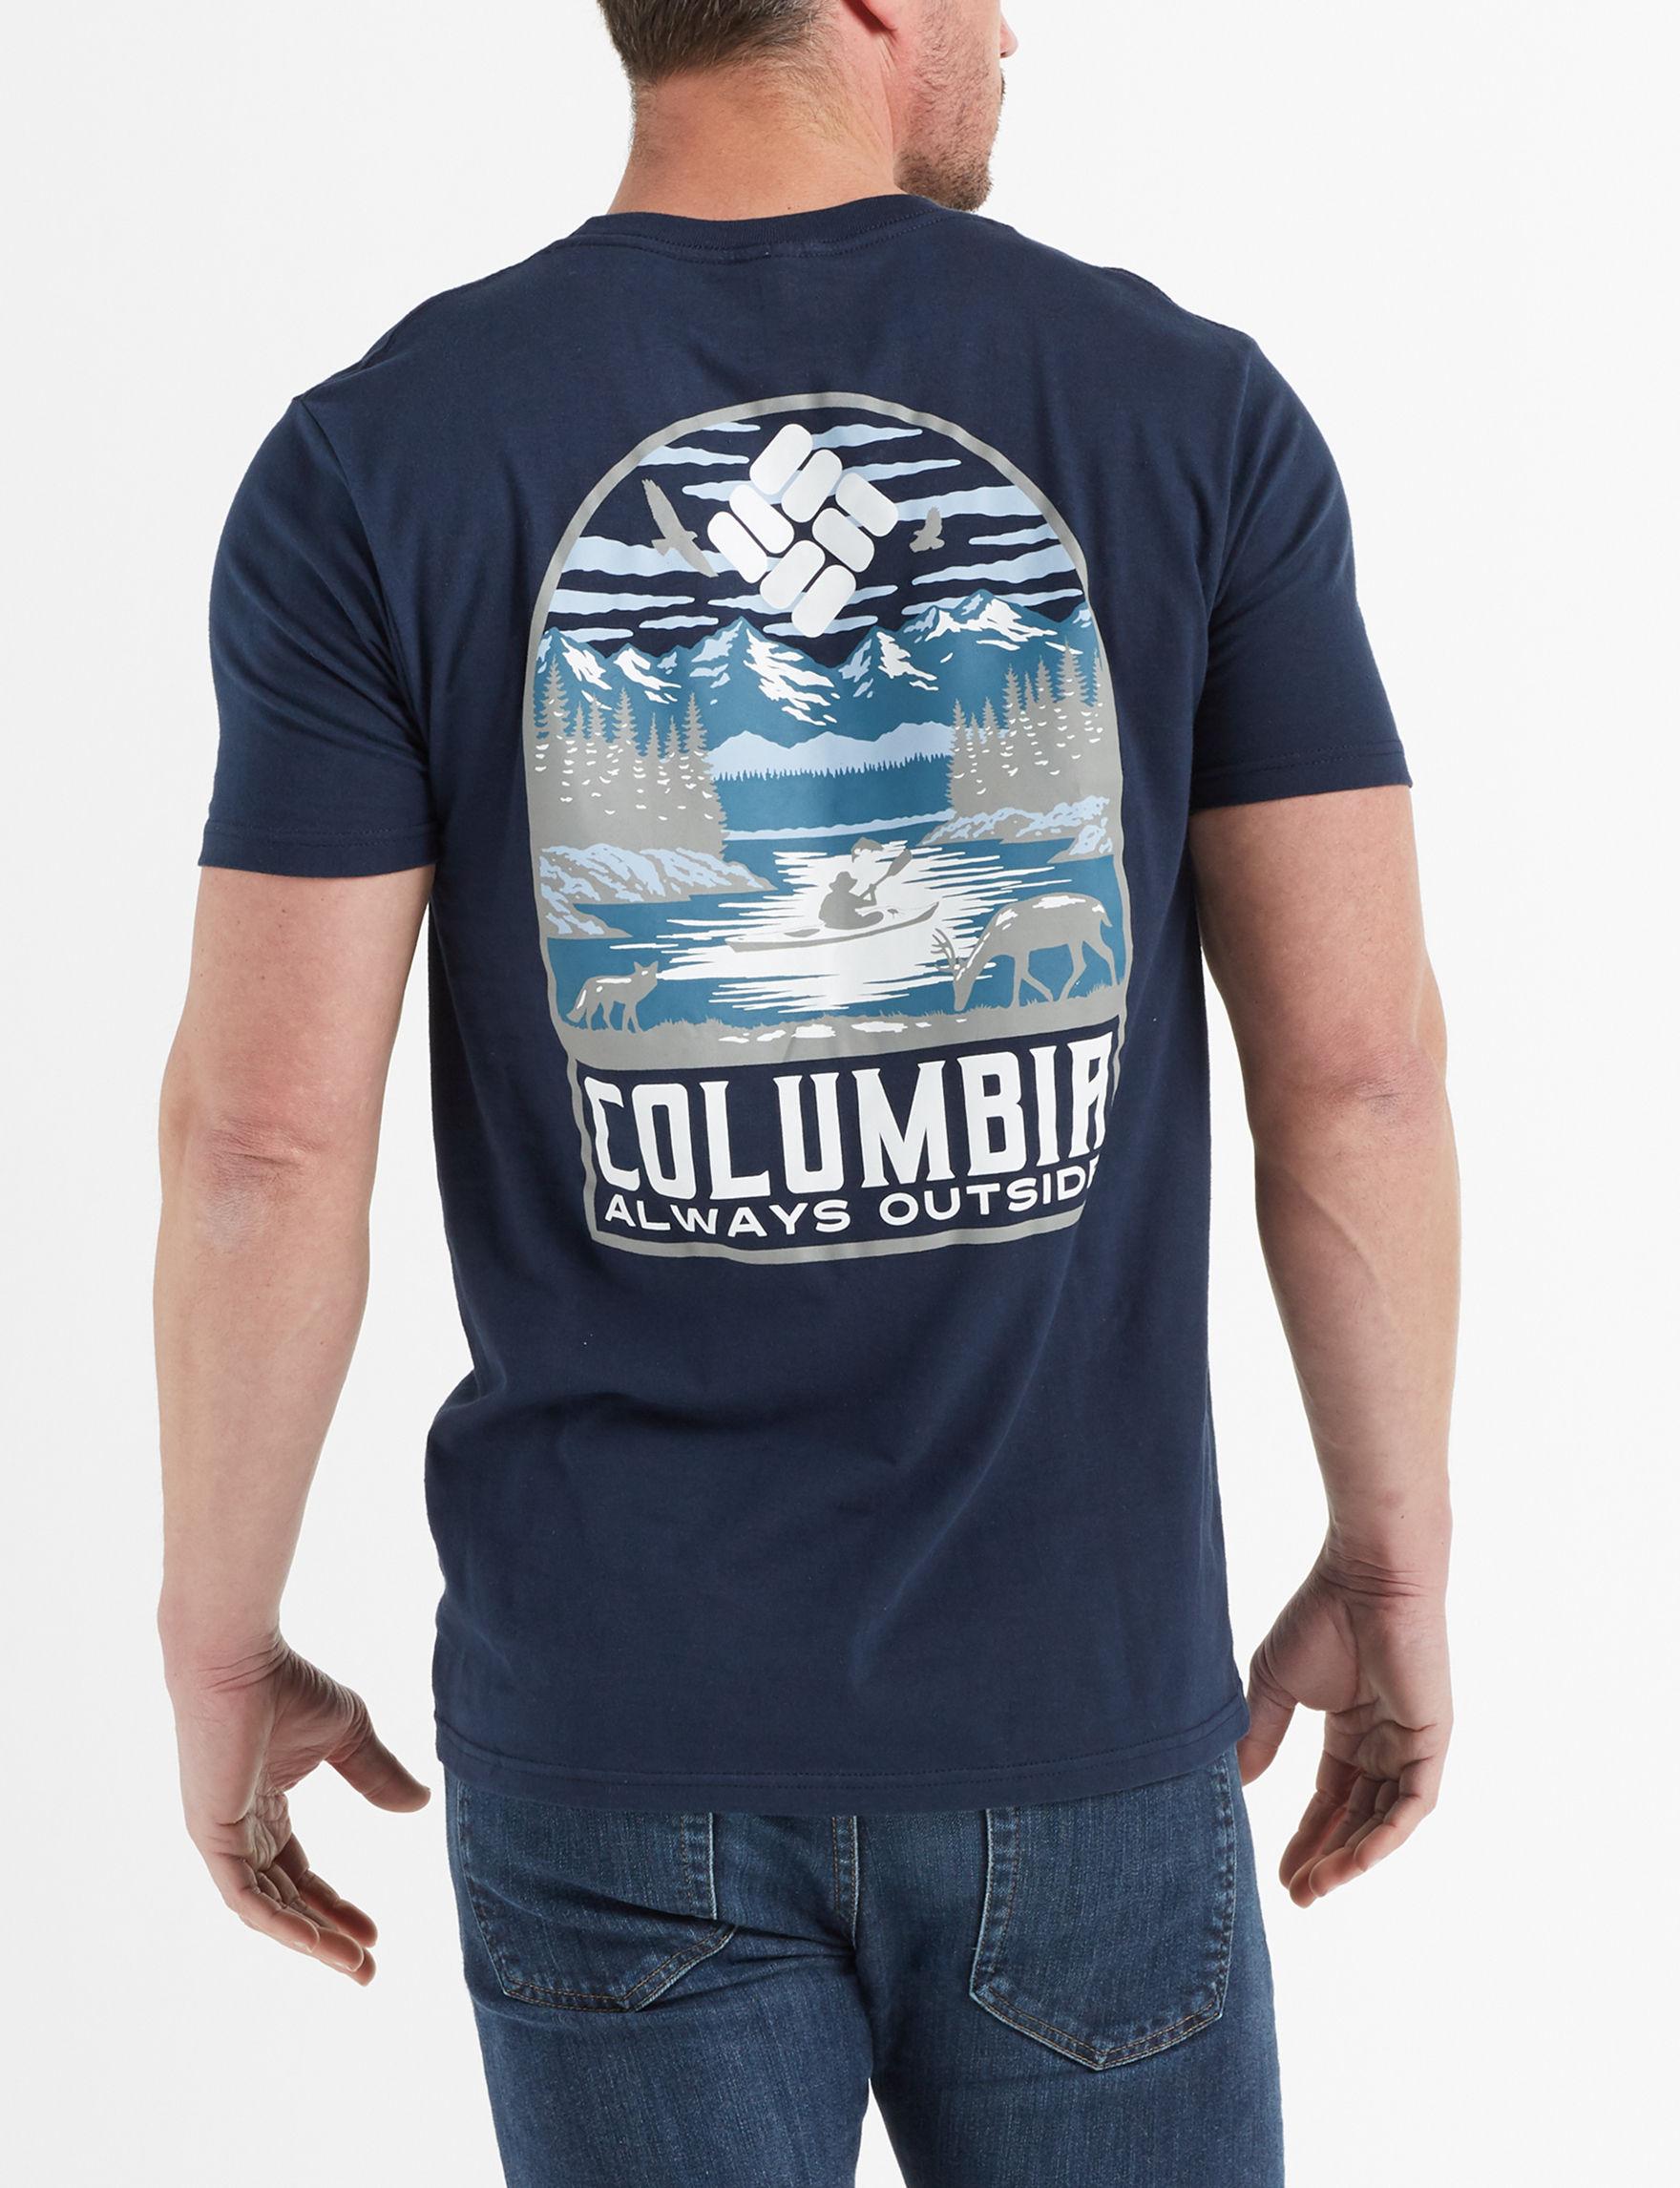 Columbia Columbia Navy Tees & Tanks